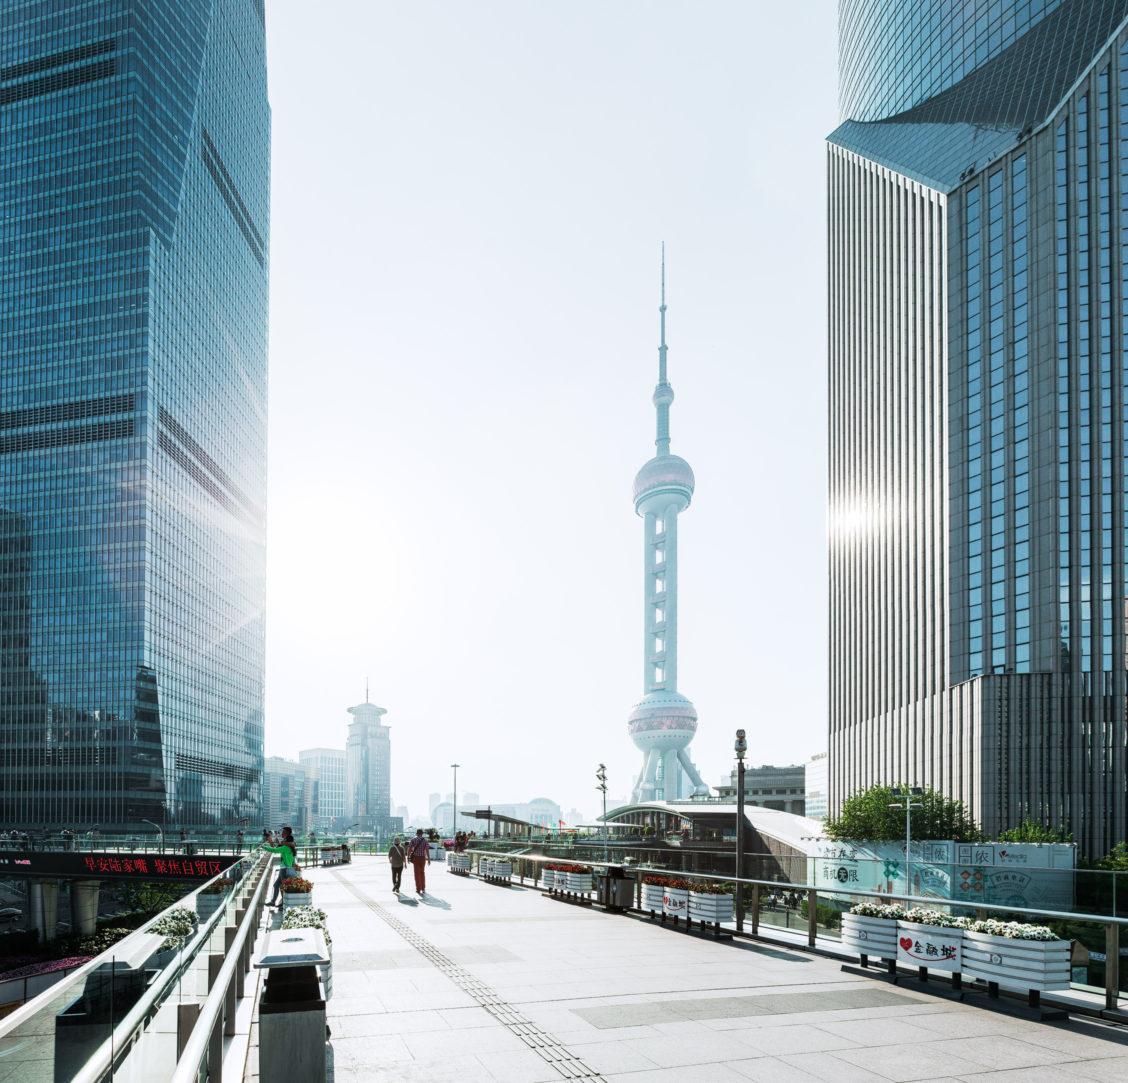 shanghai pedestrian bridge